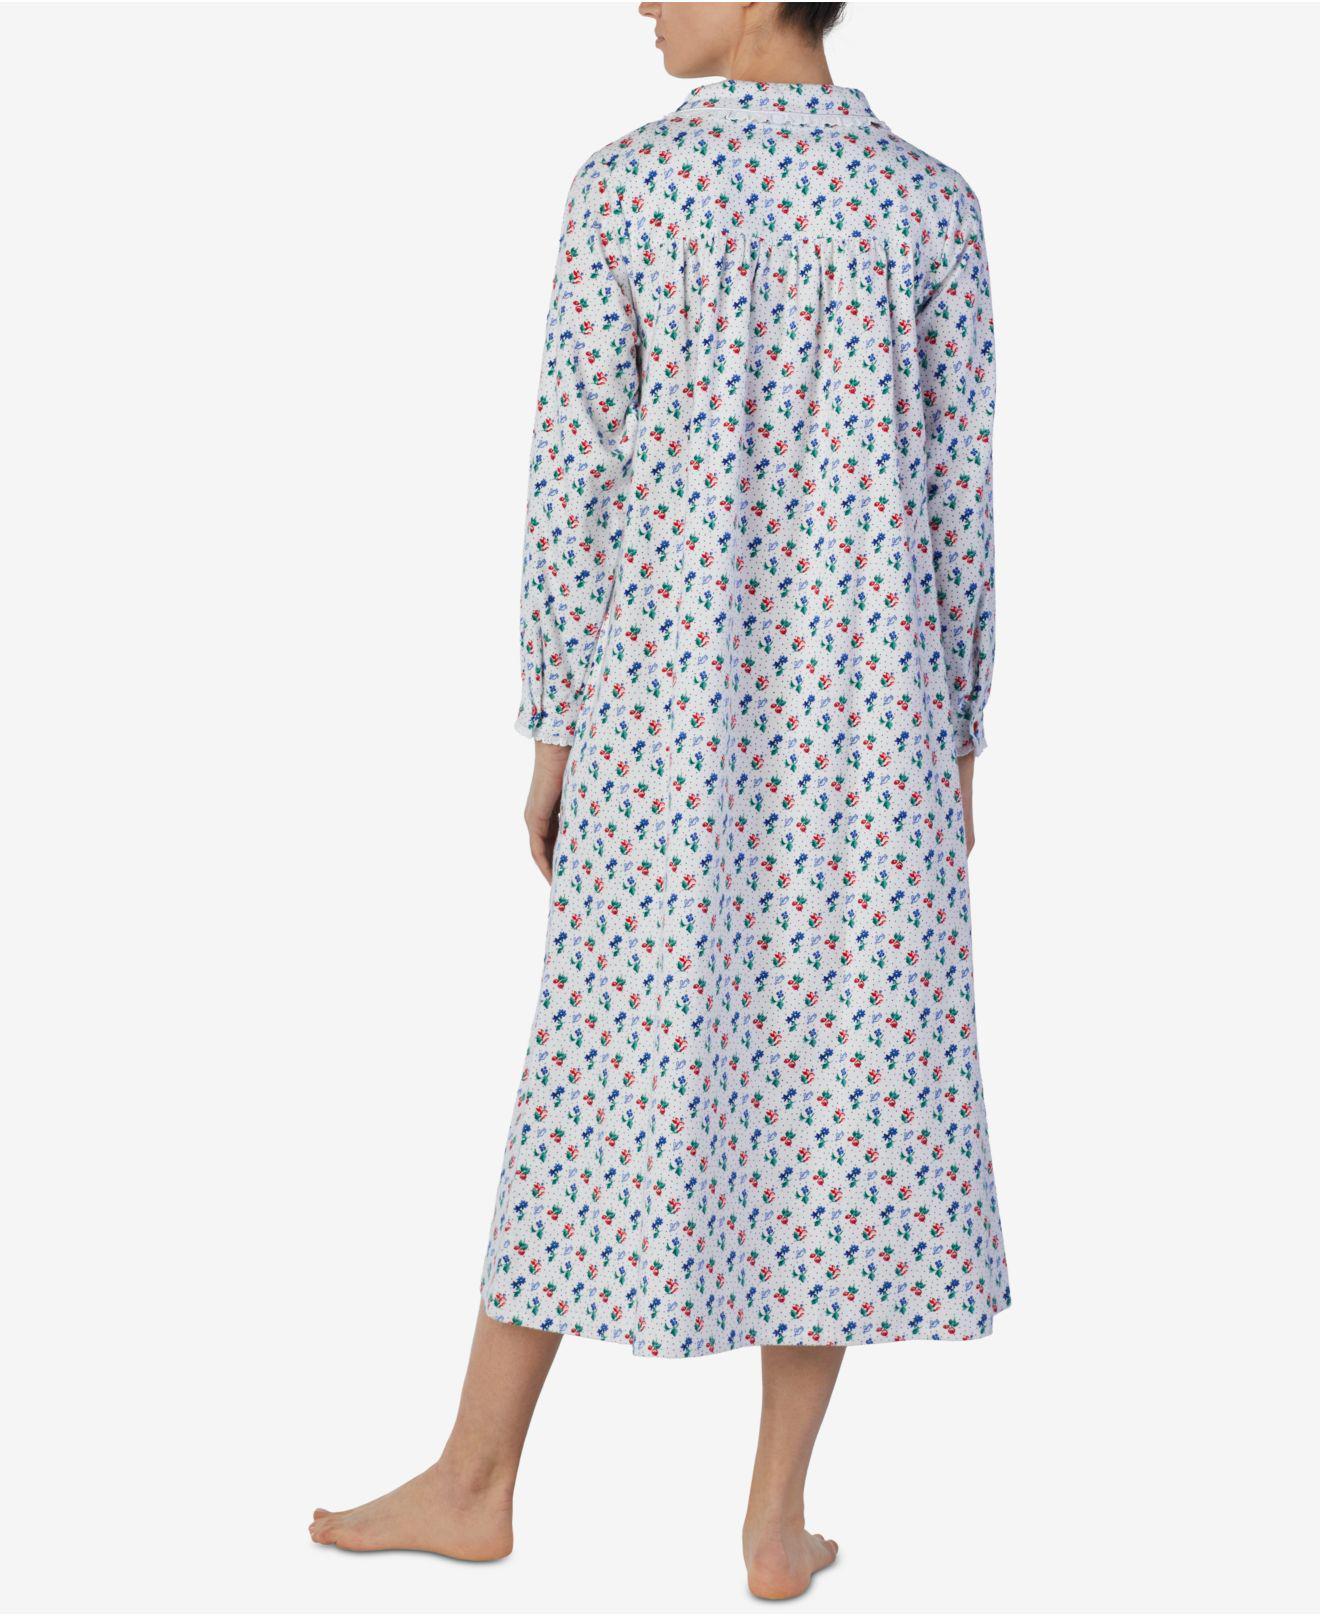 34cb9b161a Lyst - Lanz Of Salzburg Printed Cotton Flannel Nightgown in Blue